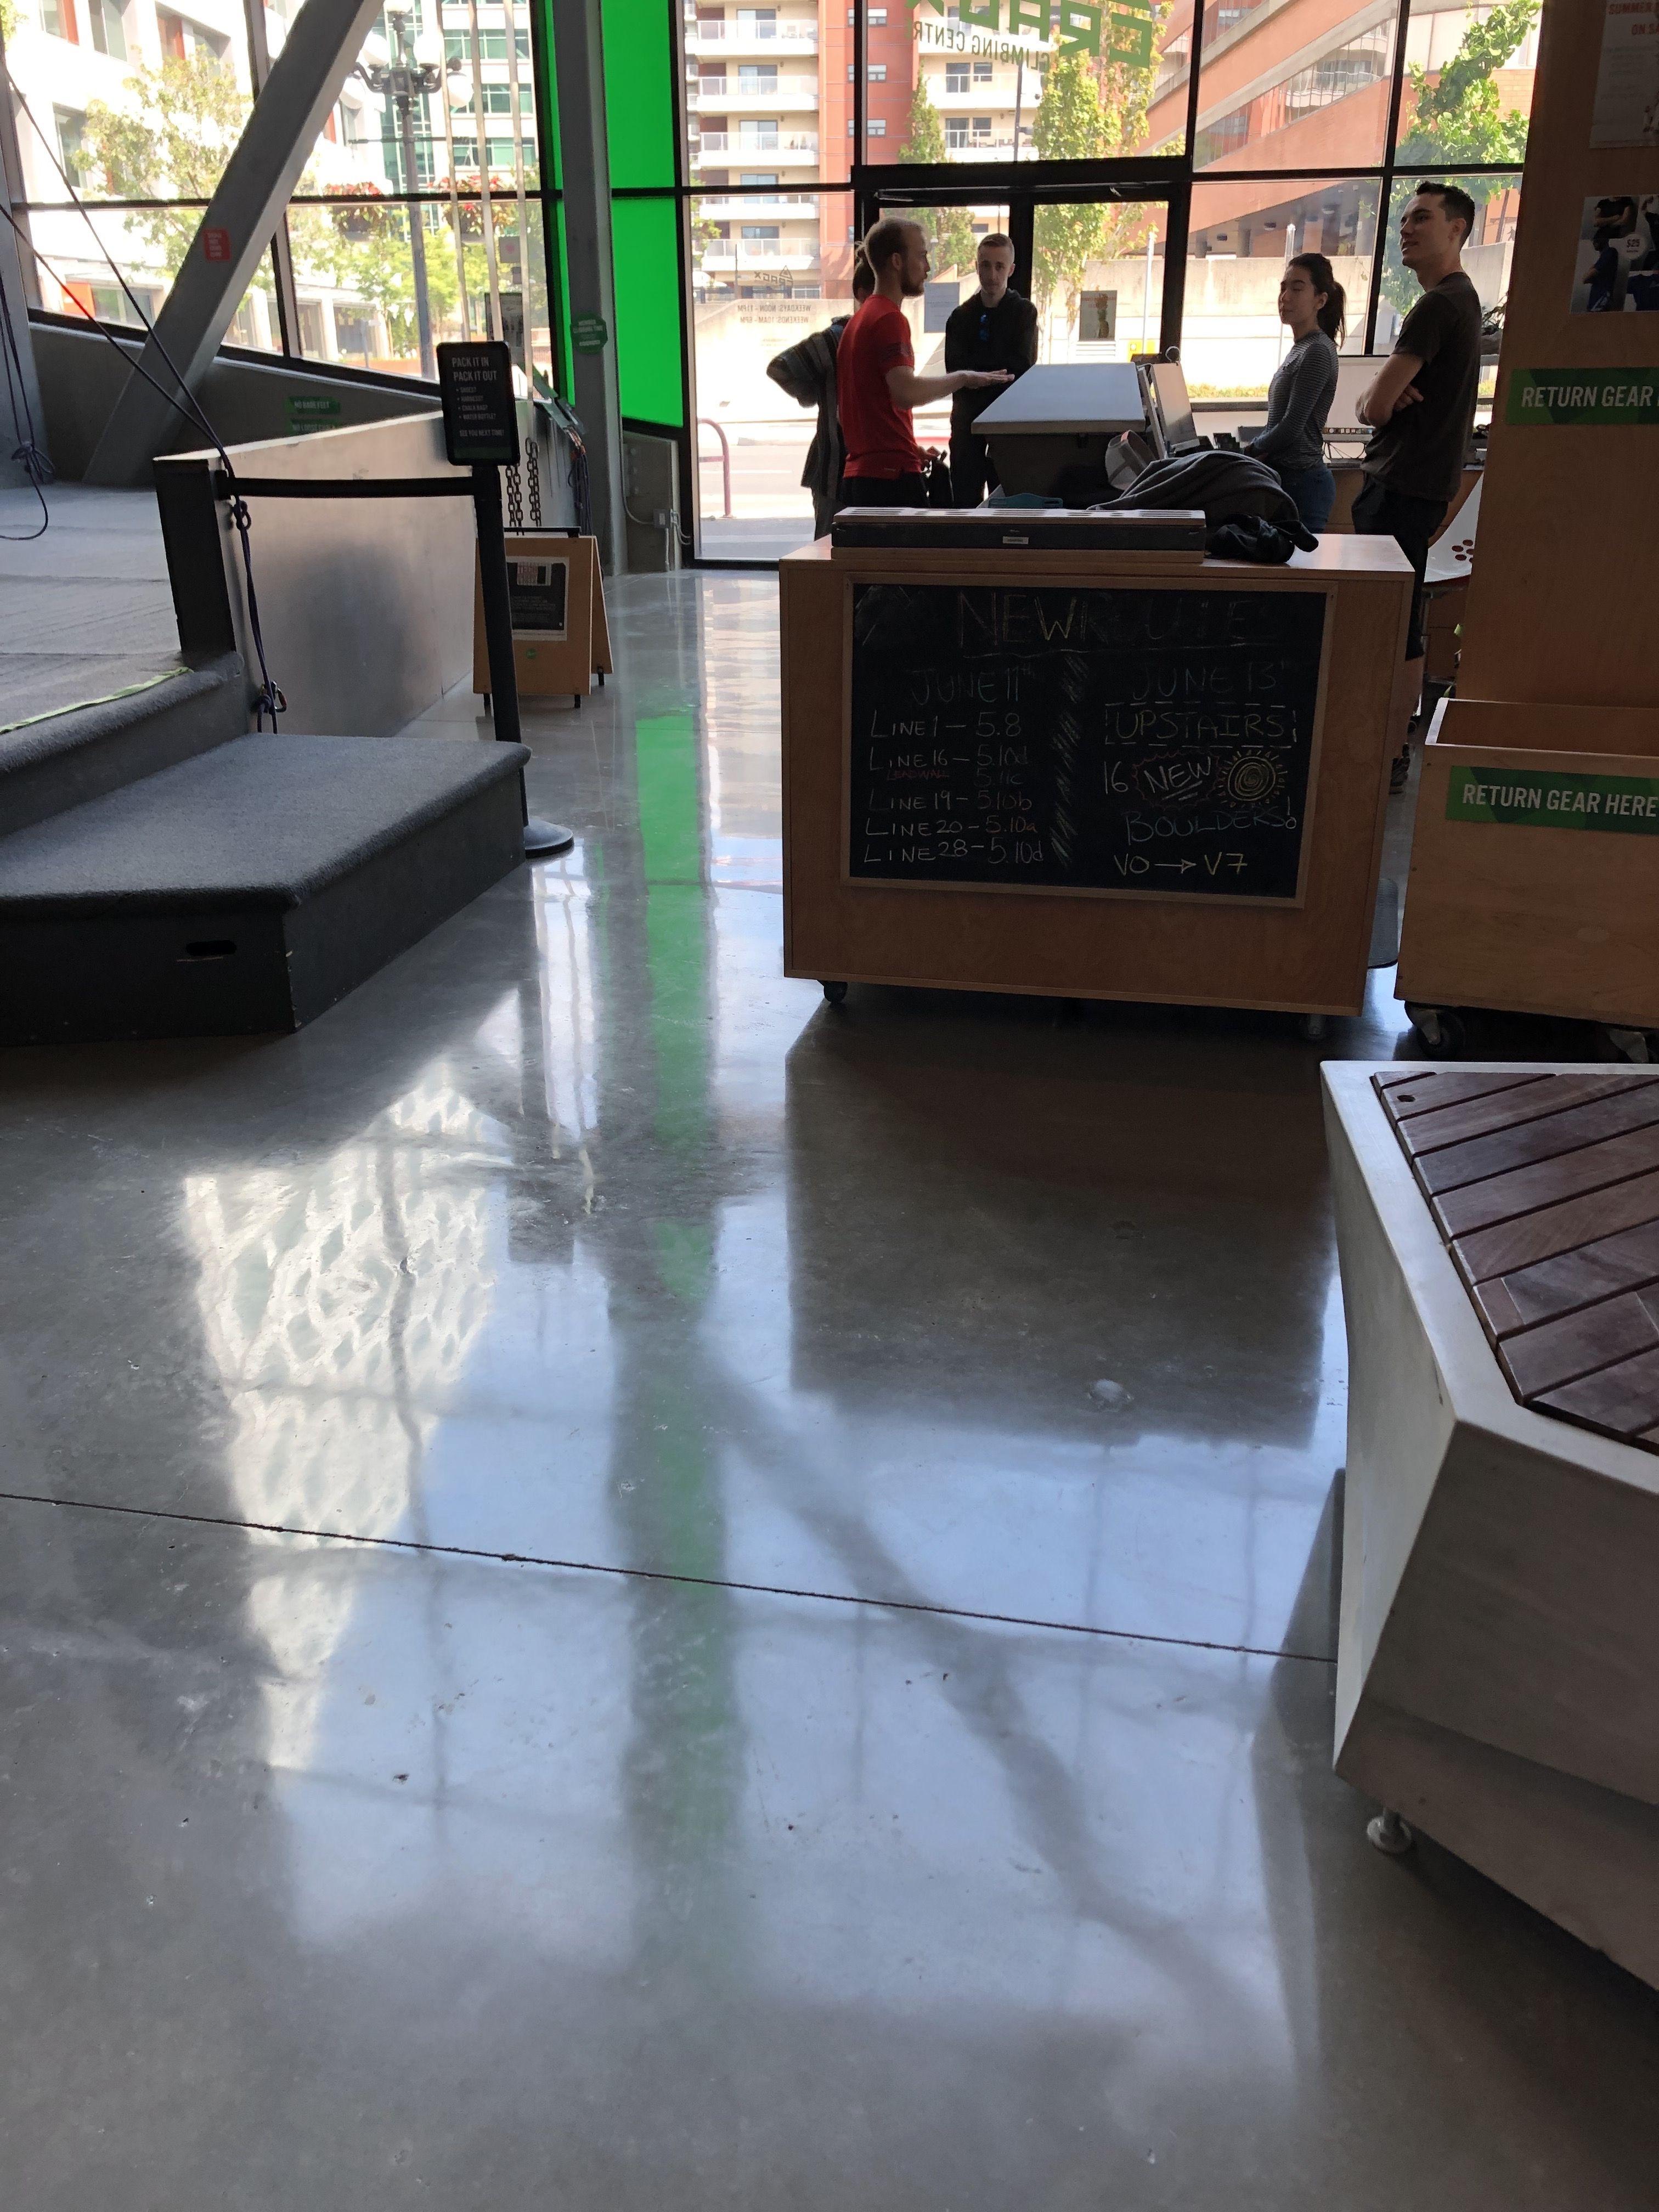 800 grit polished concrete floor for crag X gym in